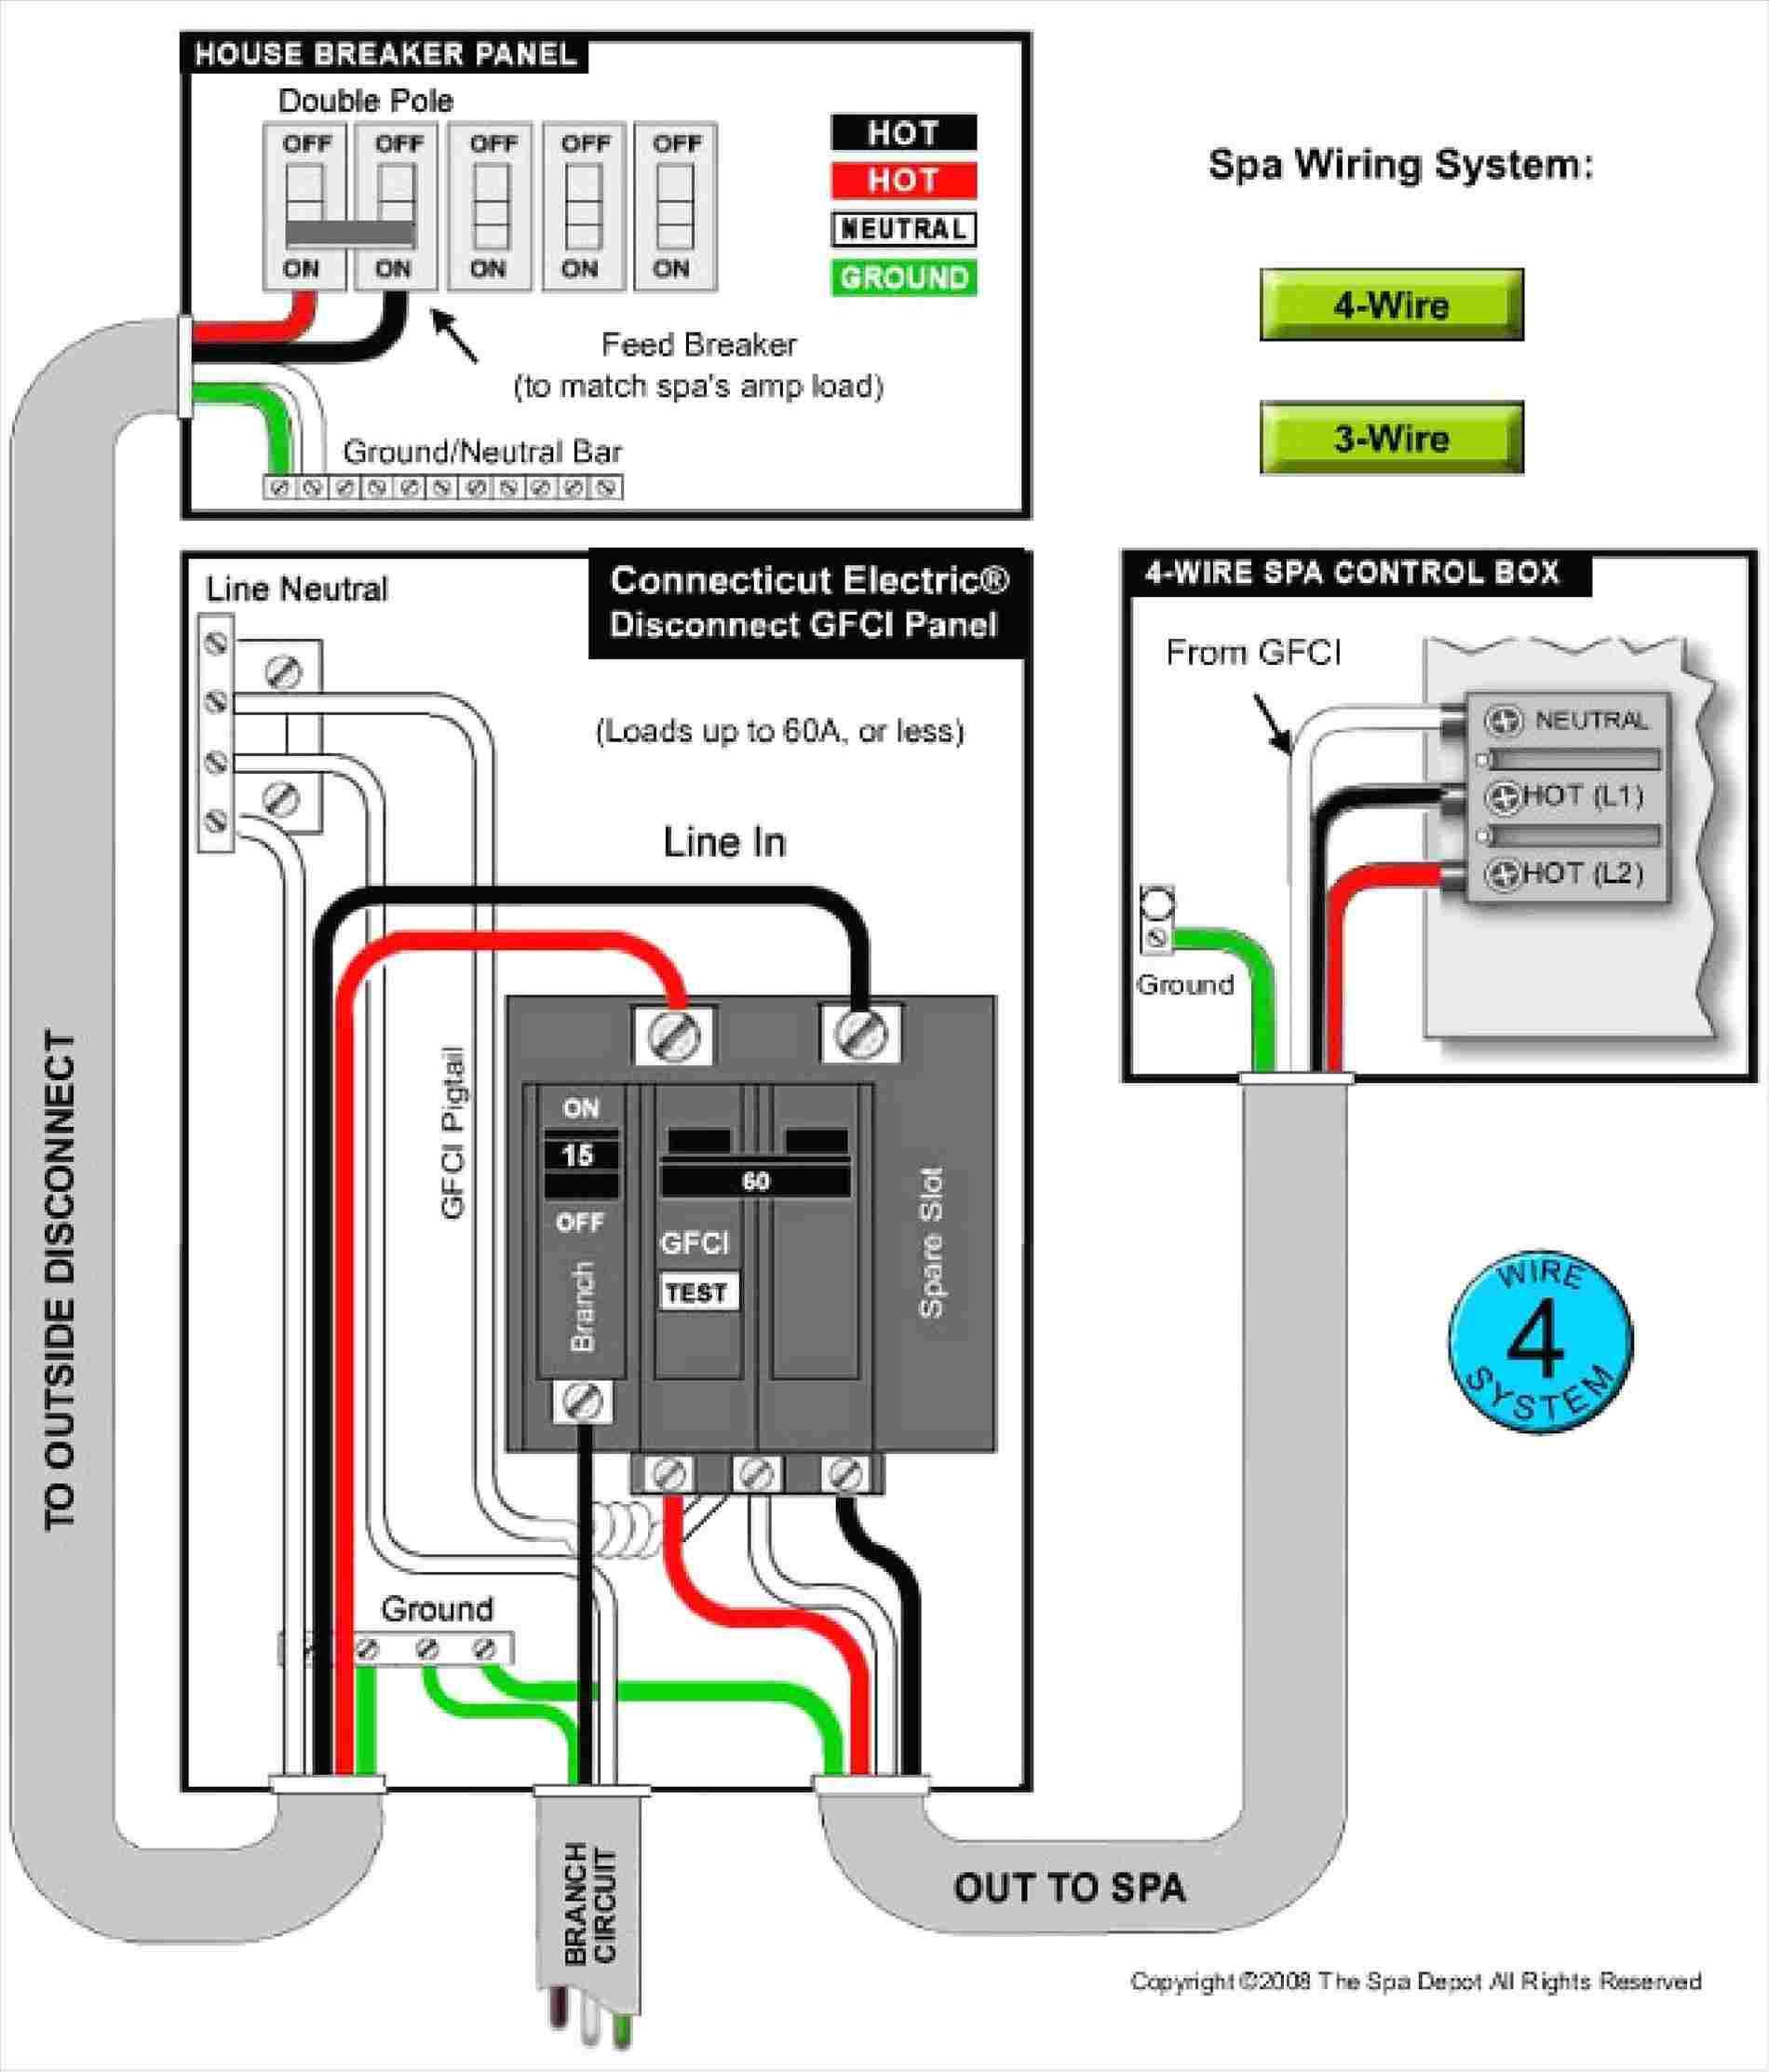 125 Amp Sub Panel Wiring Diagram | Manual E-Books - 125 Amp Sub Panel Wiring Diagram